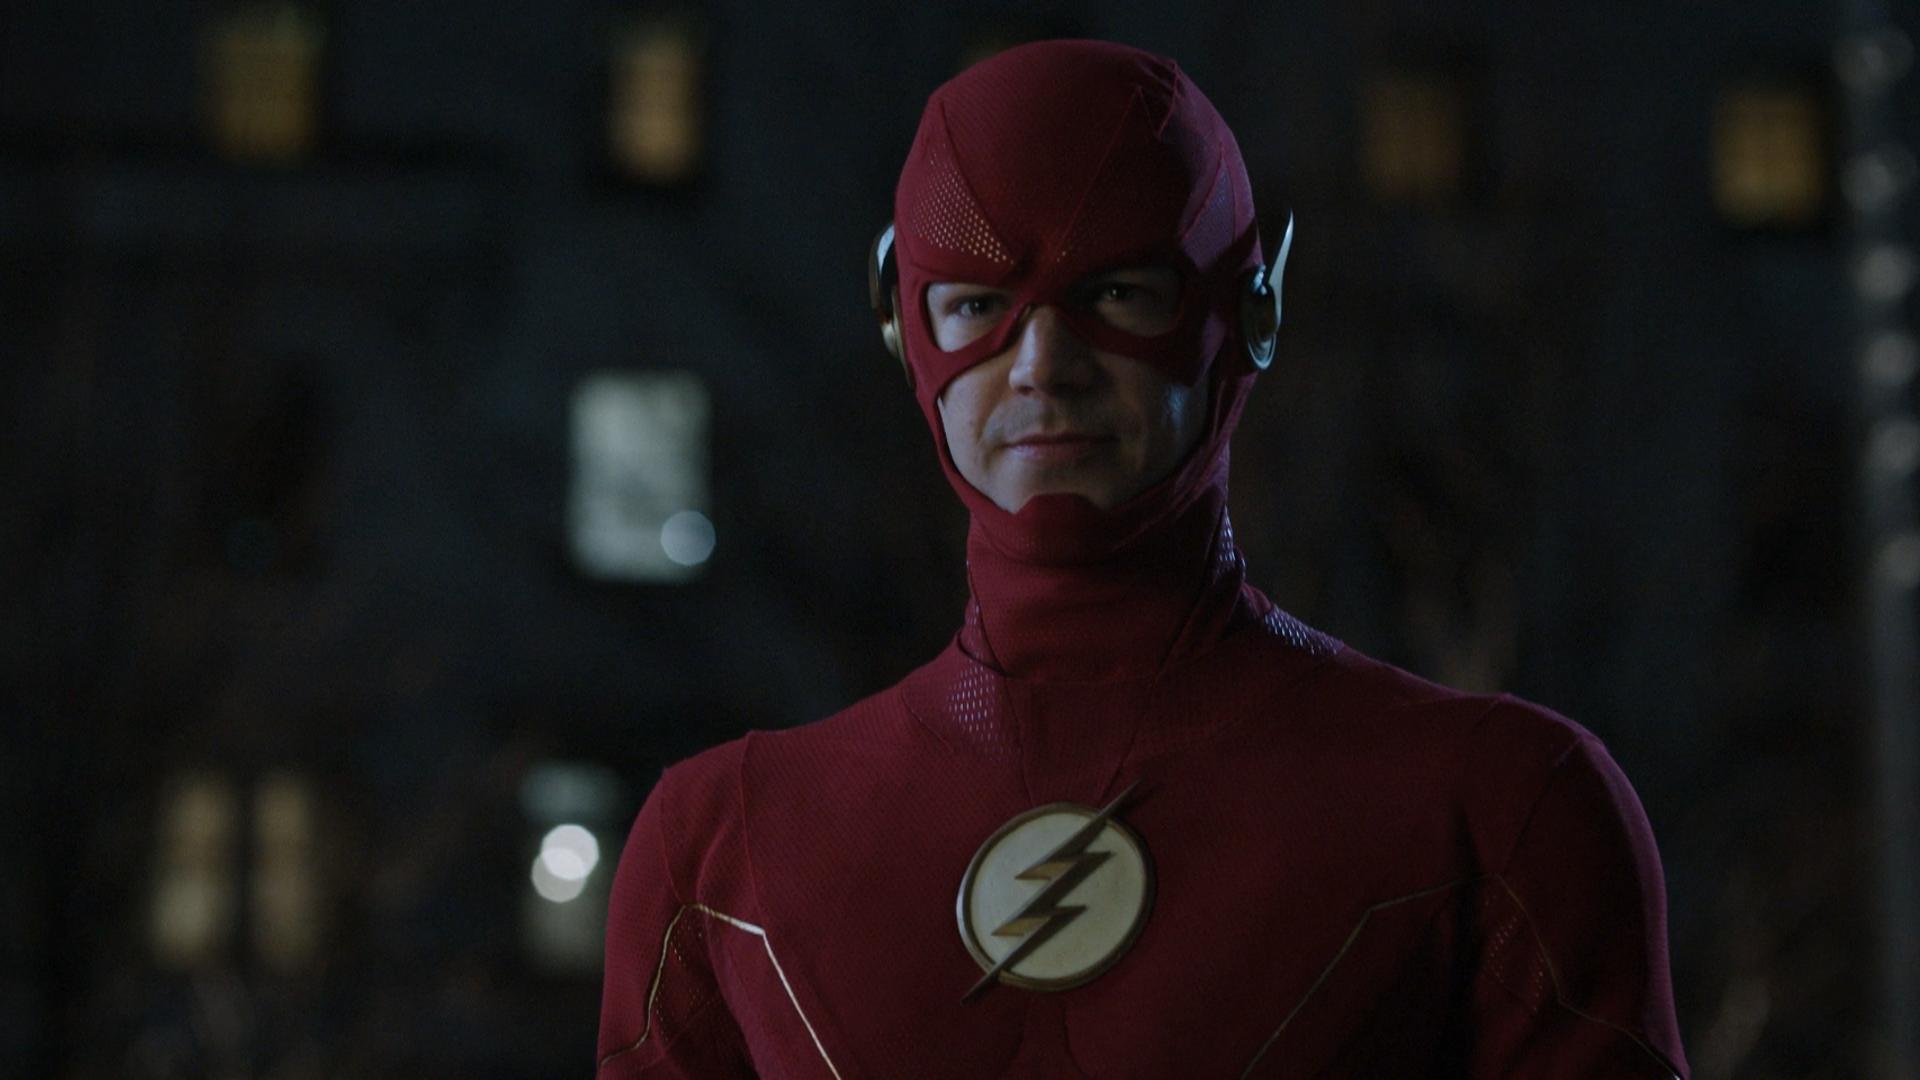 The Flash arrow DC Comics Barry Allen Gotham legends arrowverse